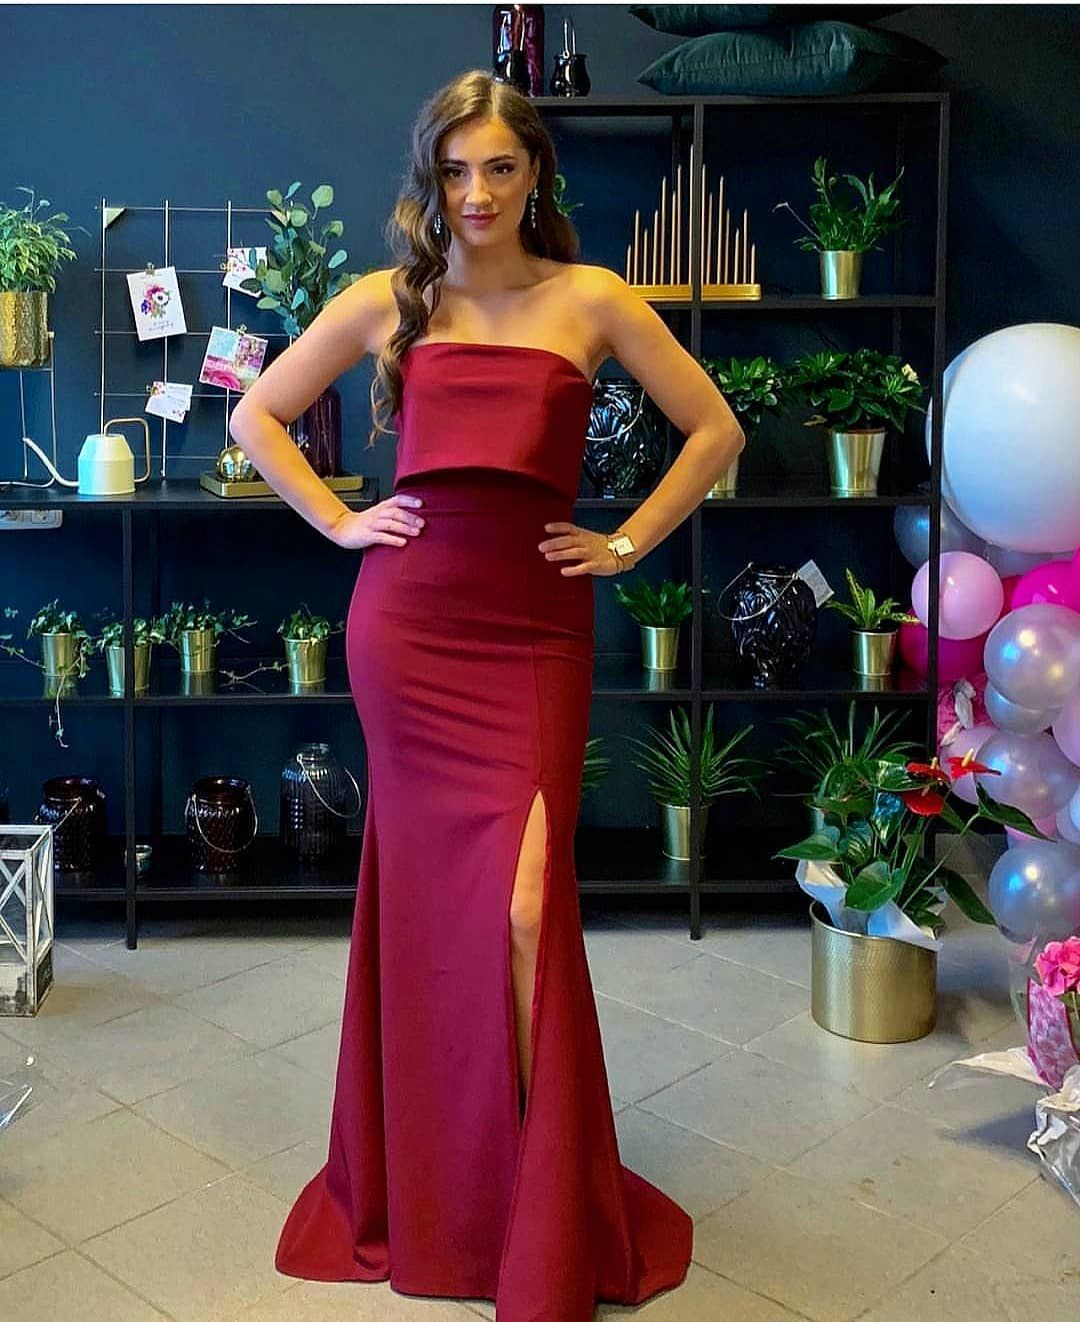 a970bff4c6d3 Mesmerising @erna_da in our AMBER gown in berry. #ootd #lookoftheday  #dressgoals #asseenonme #asos #occasionwear #eveningwear #promdress  #eveninggowns